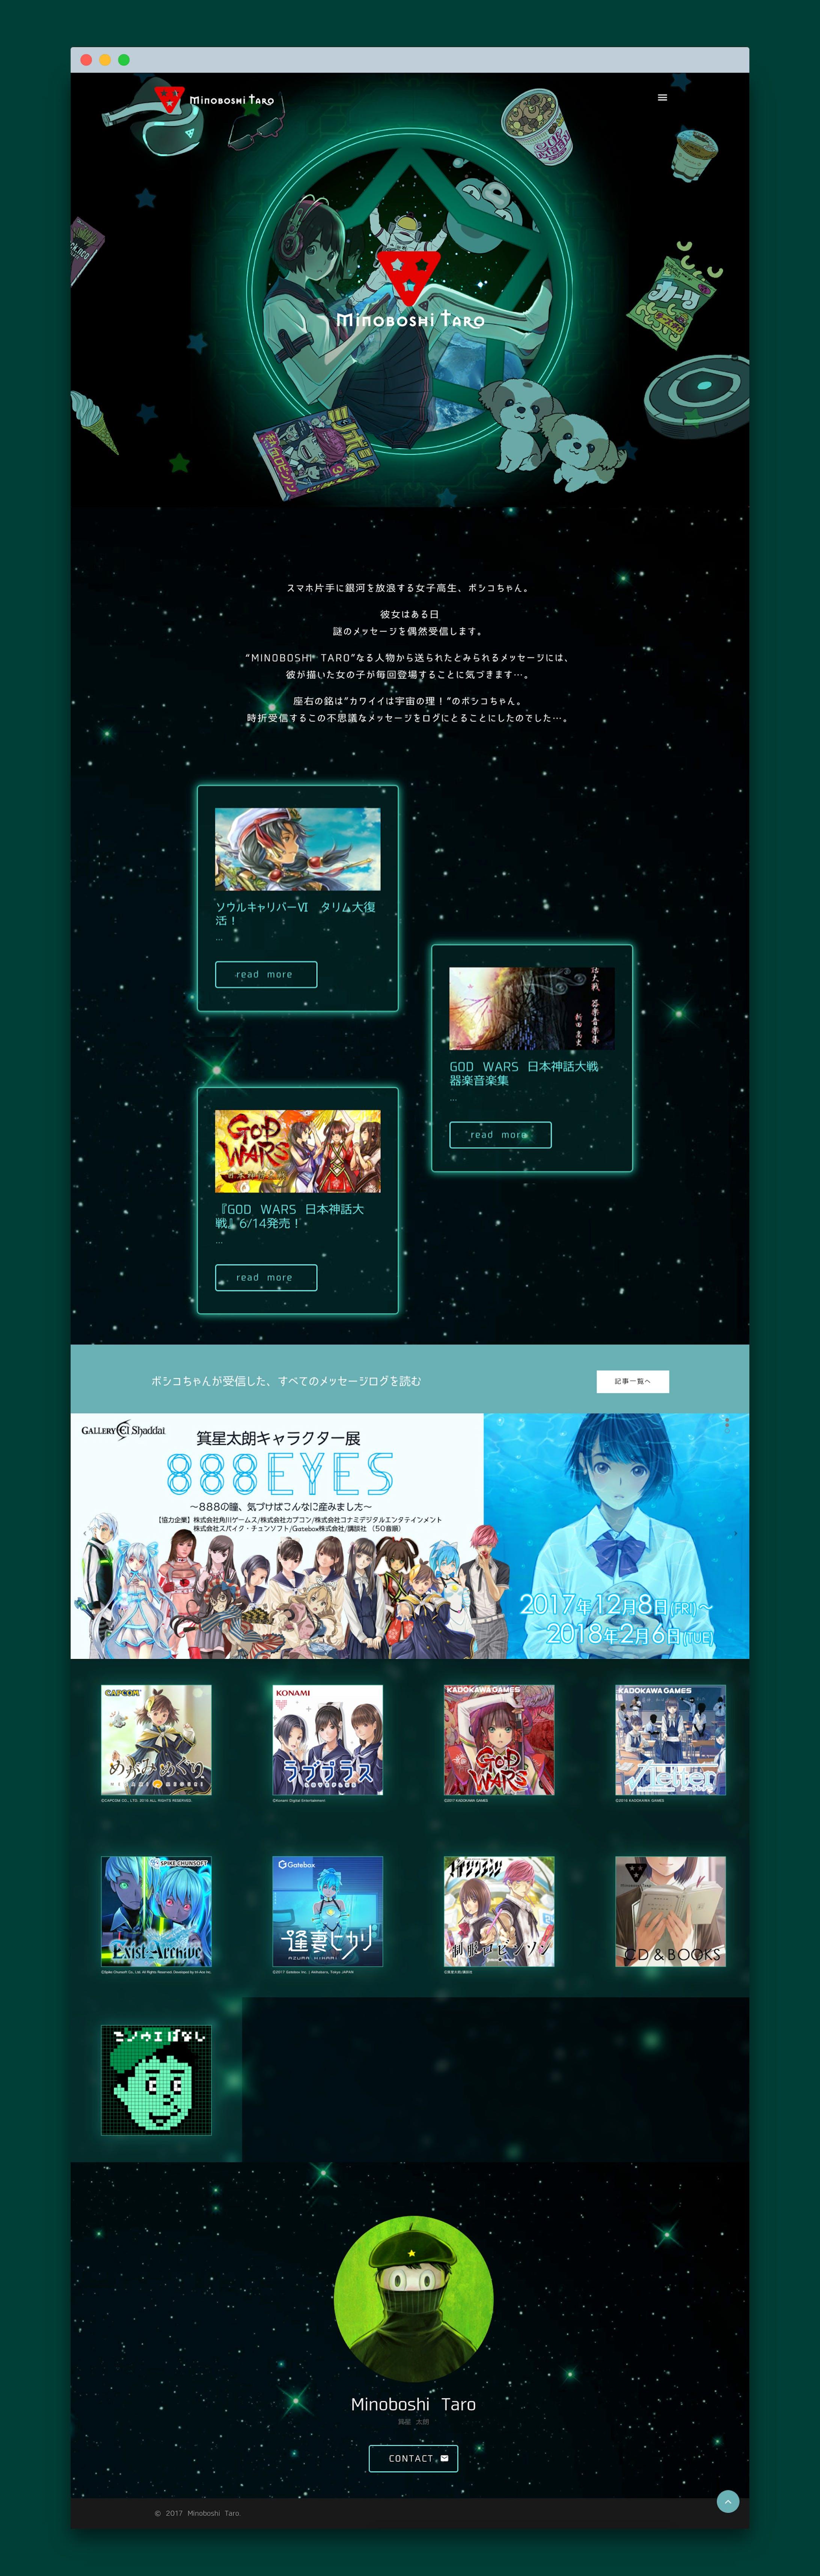 Minoboshi Taro's official website-2